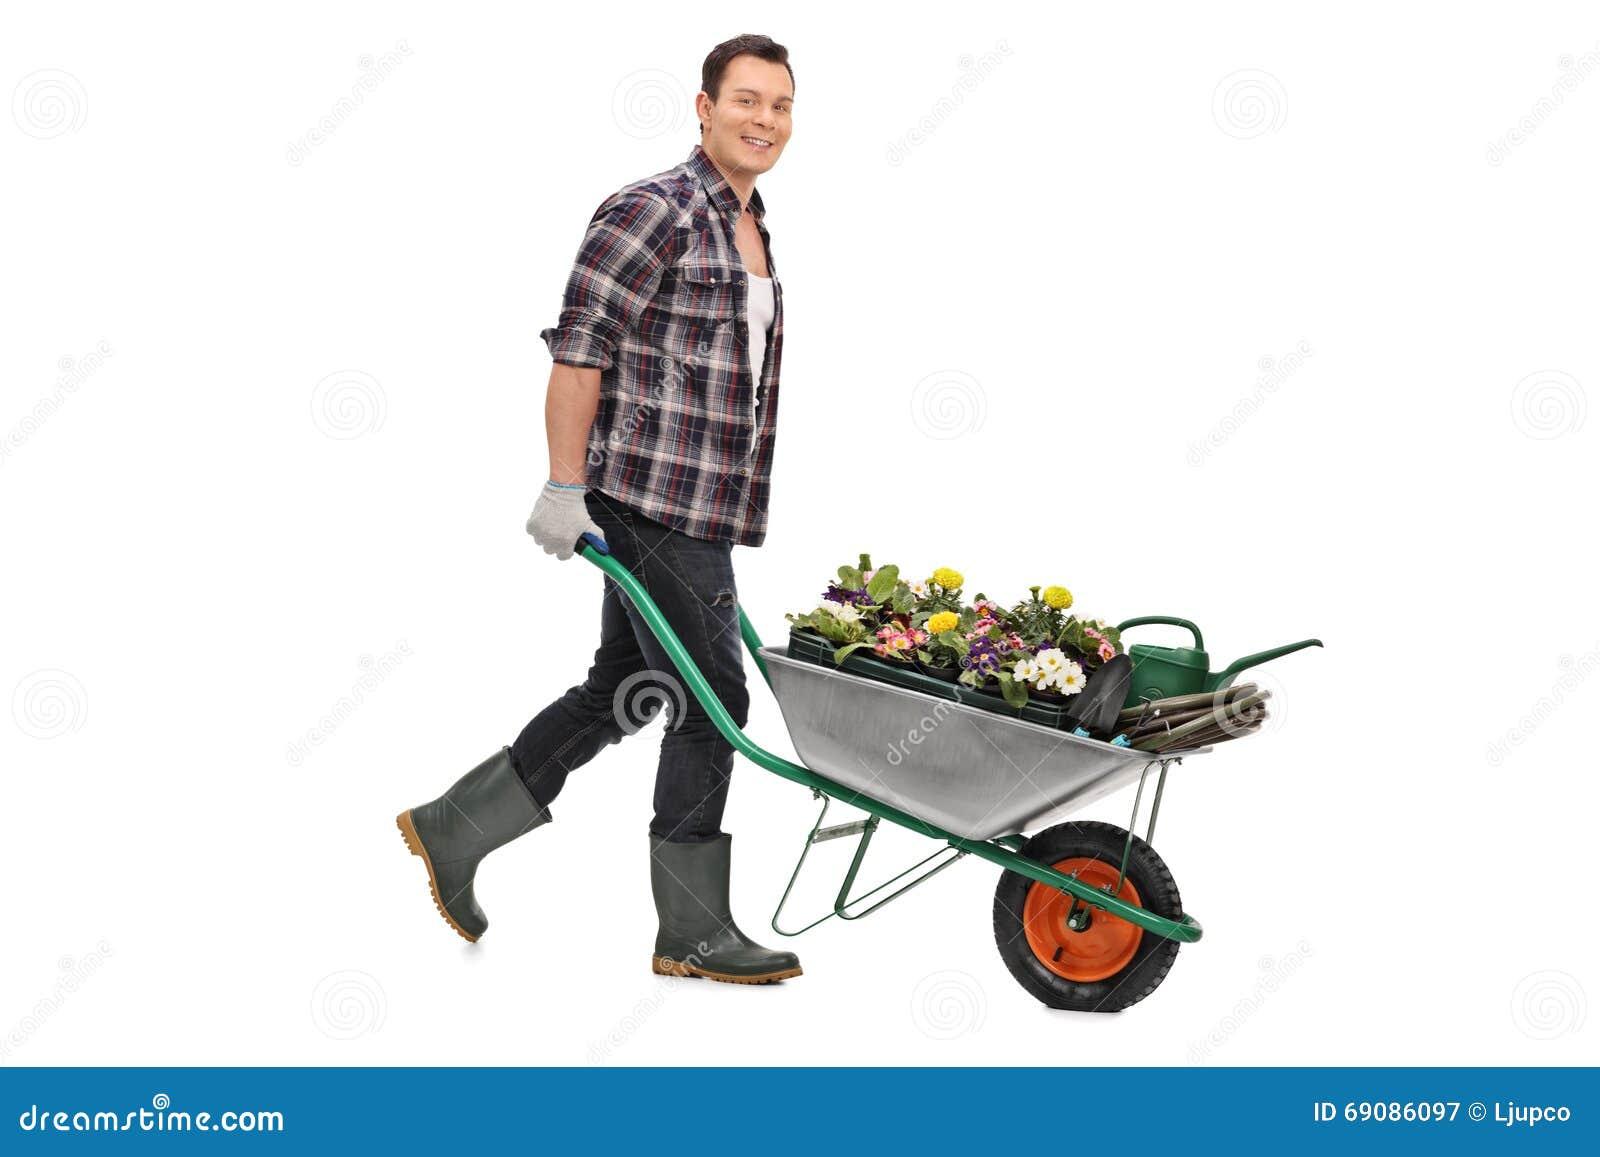 Brouette jardinier for Jardinier tarif horaire